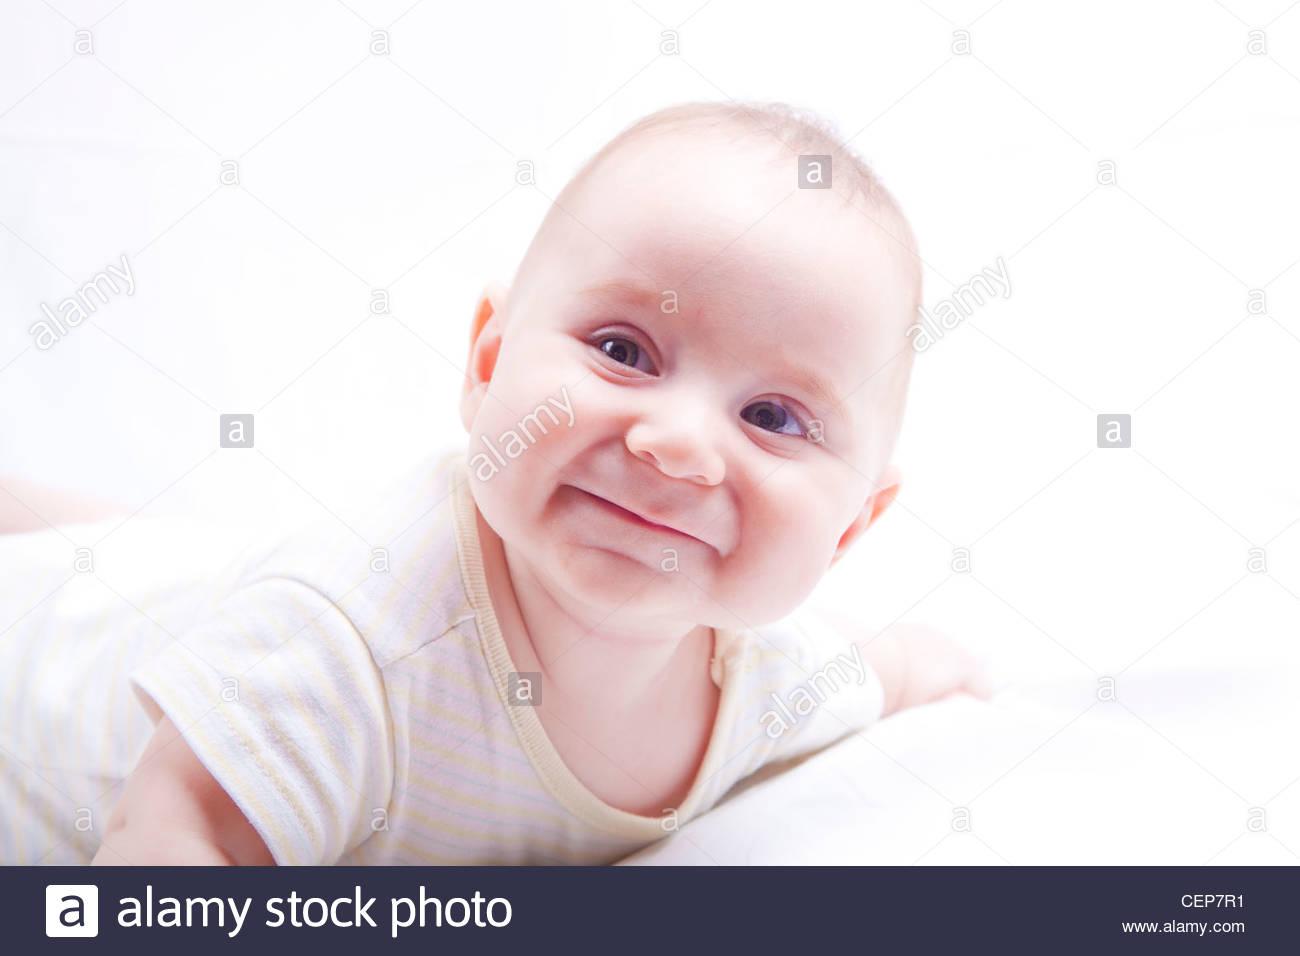 Cute Baby Boy Smiling Lays Photos Cute Baby Boy Smiling Lays